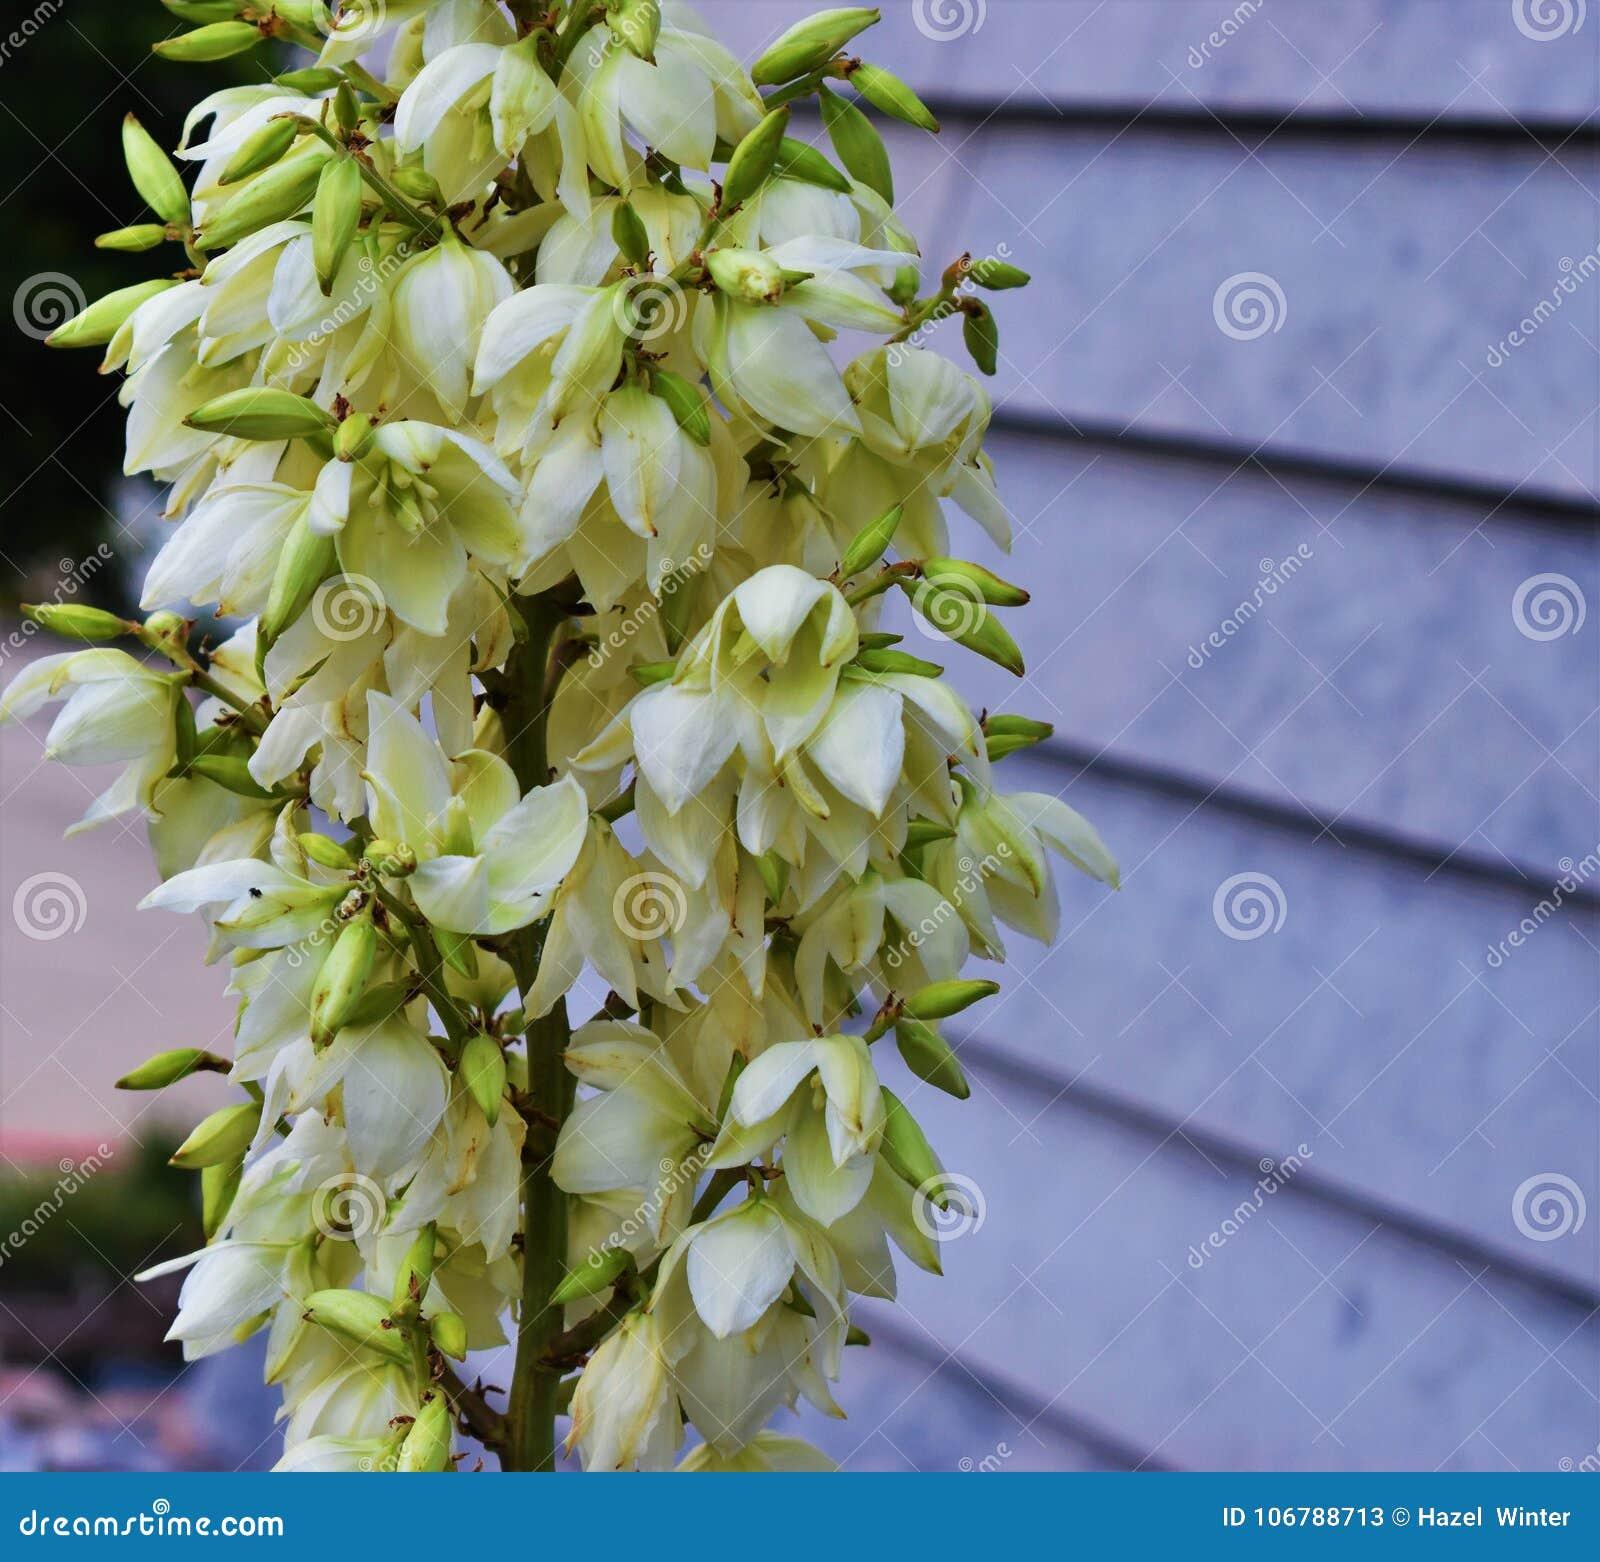 Tall White Flowers Stock Image Image Of Florist Closeup 106788713